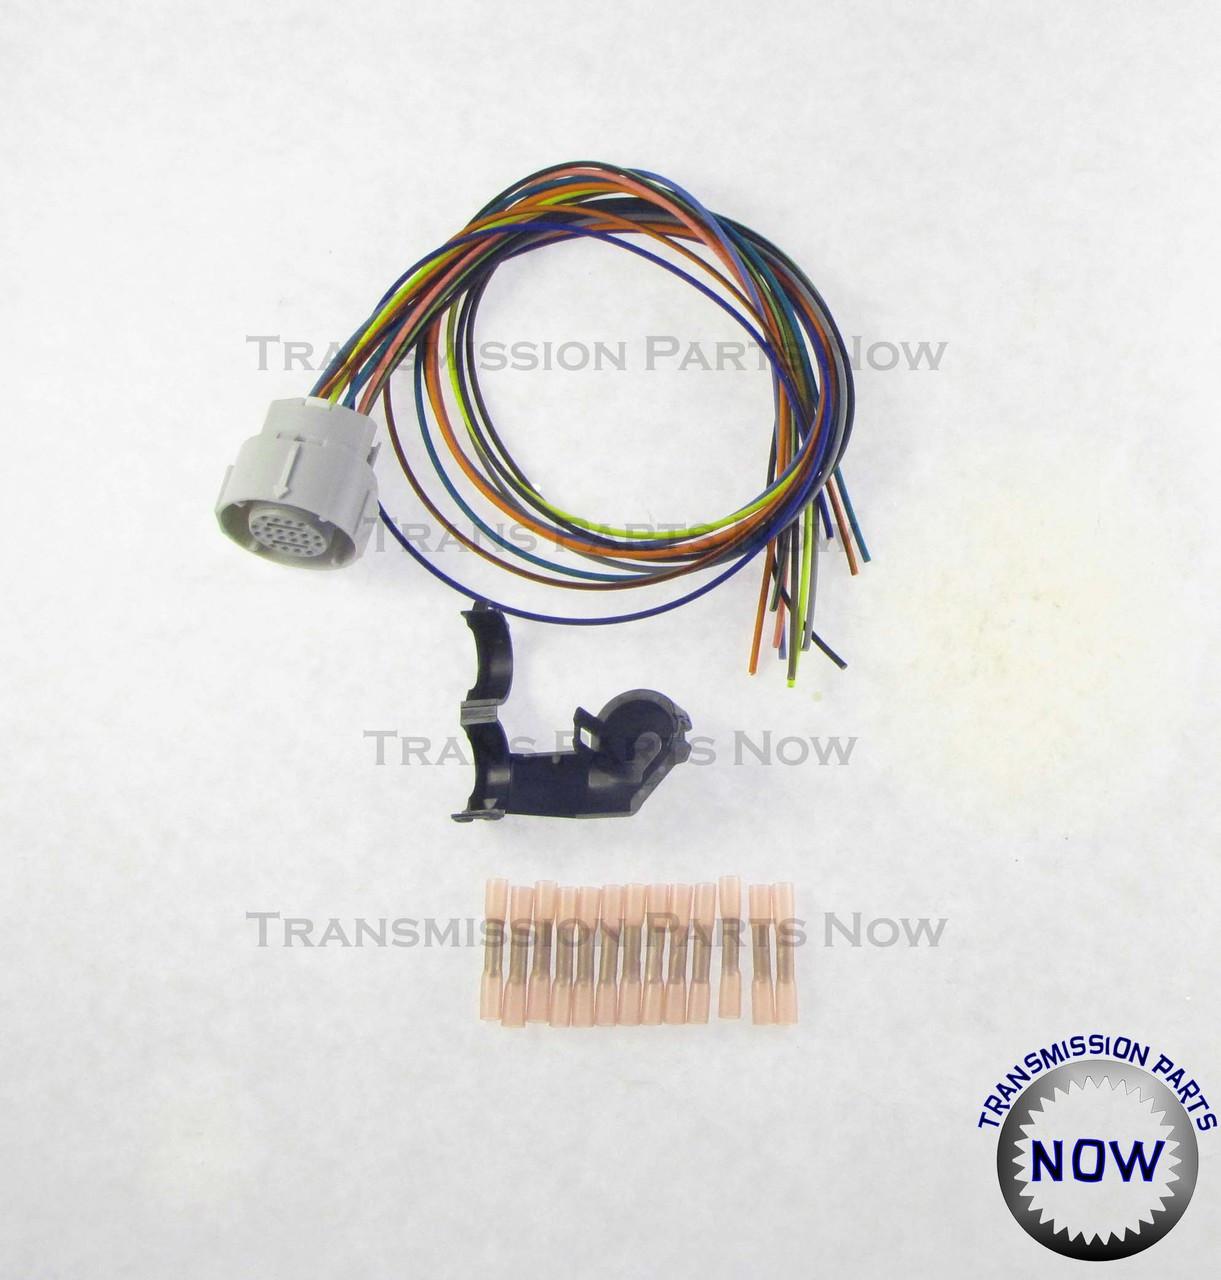 4l80e external wiring harness update kit, 34445ek  transmission parts now